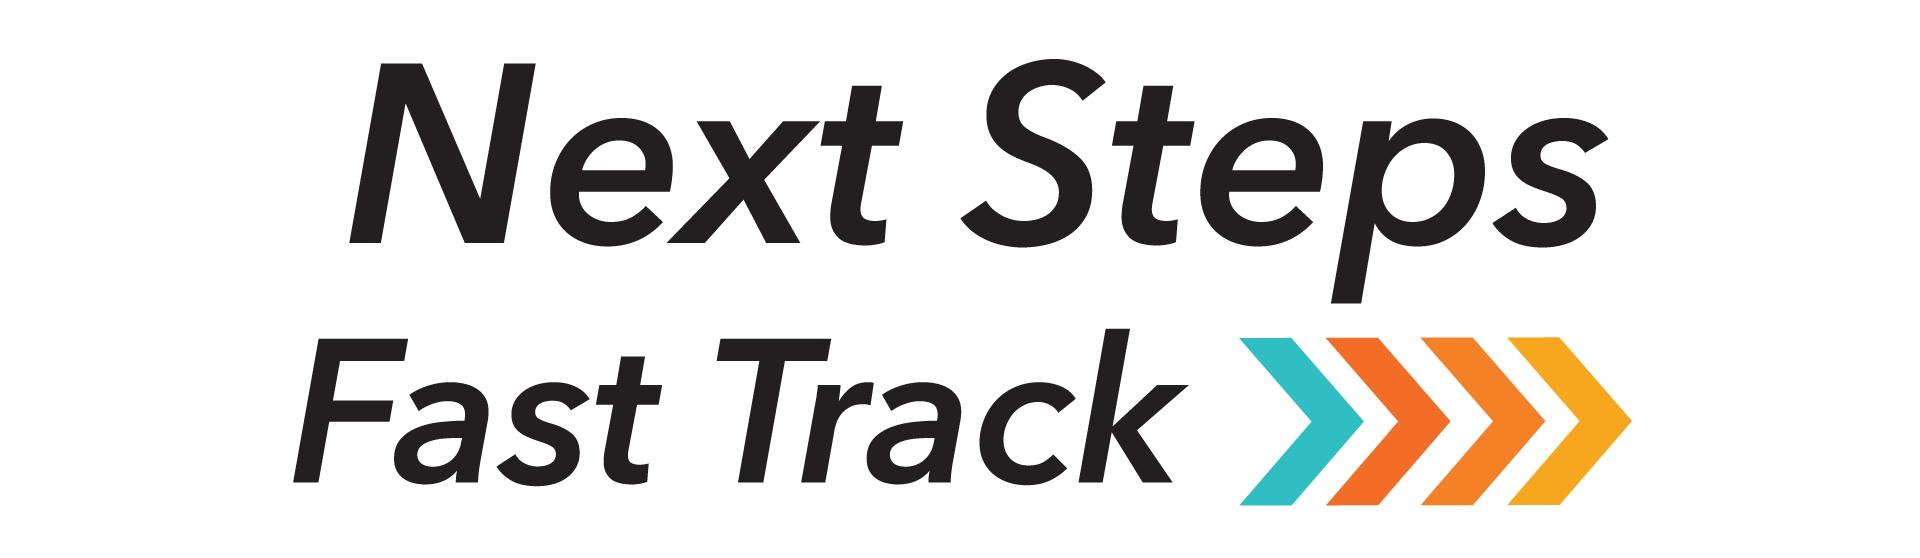 Next+Steps+Fast+Track+Web.jpg